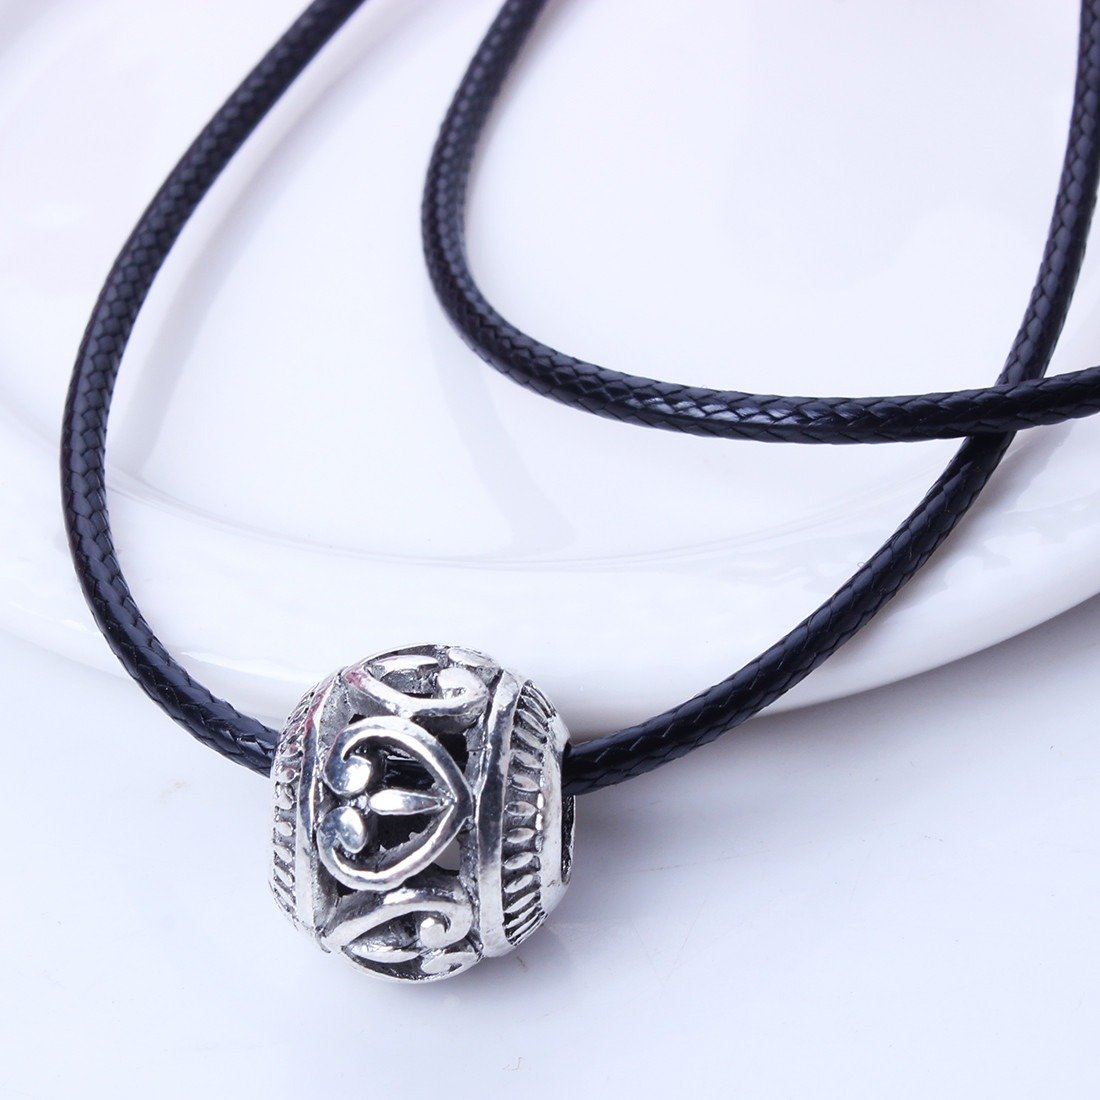 Qiyun Tibet Silver Hollow Out Slide Round Bead Slide Charm Pendant Black Rope Necklace Slide Argent Diapositives Ronde Corde Noire Collier